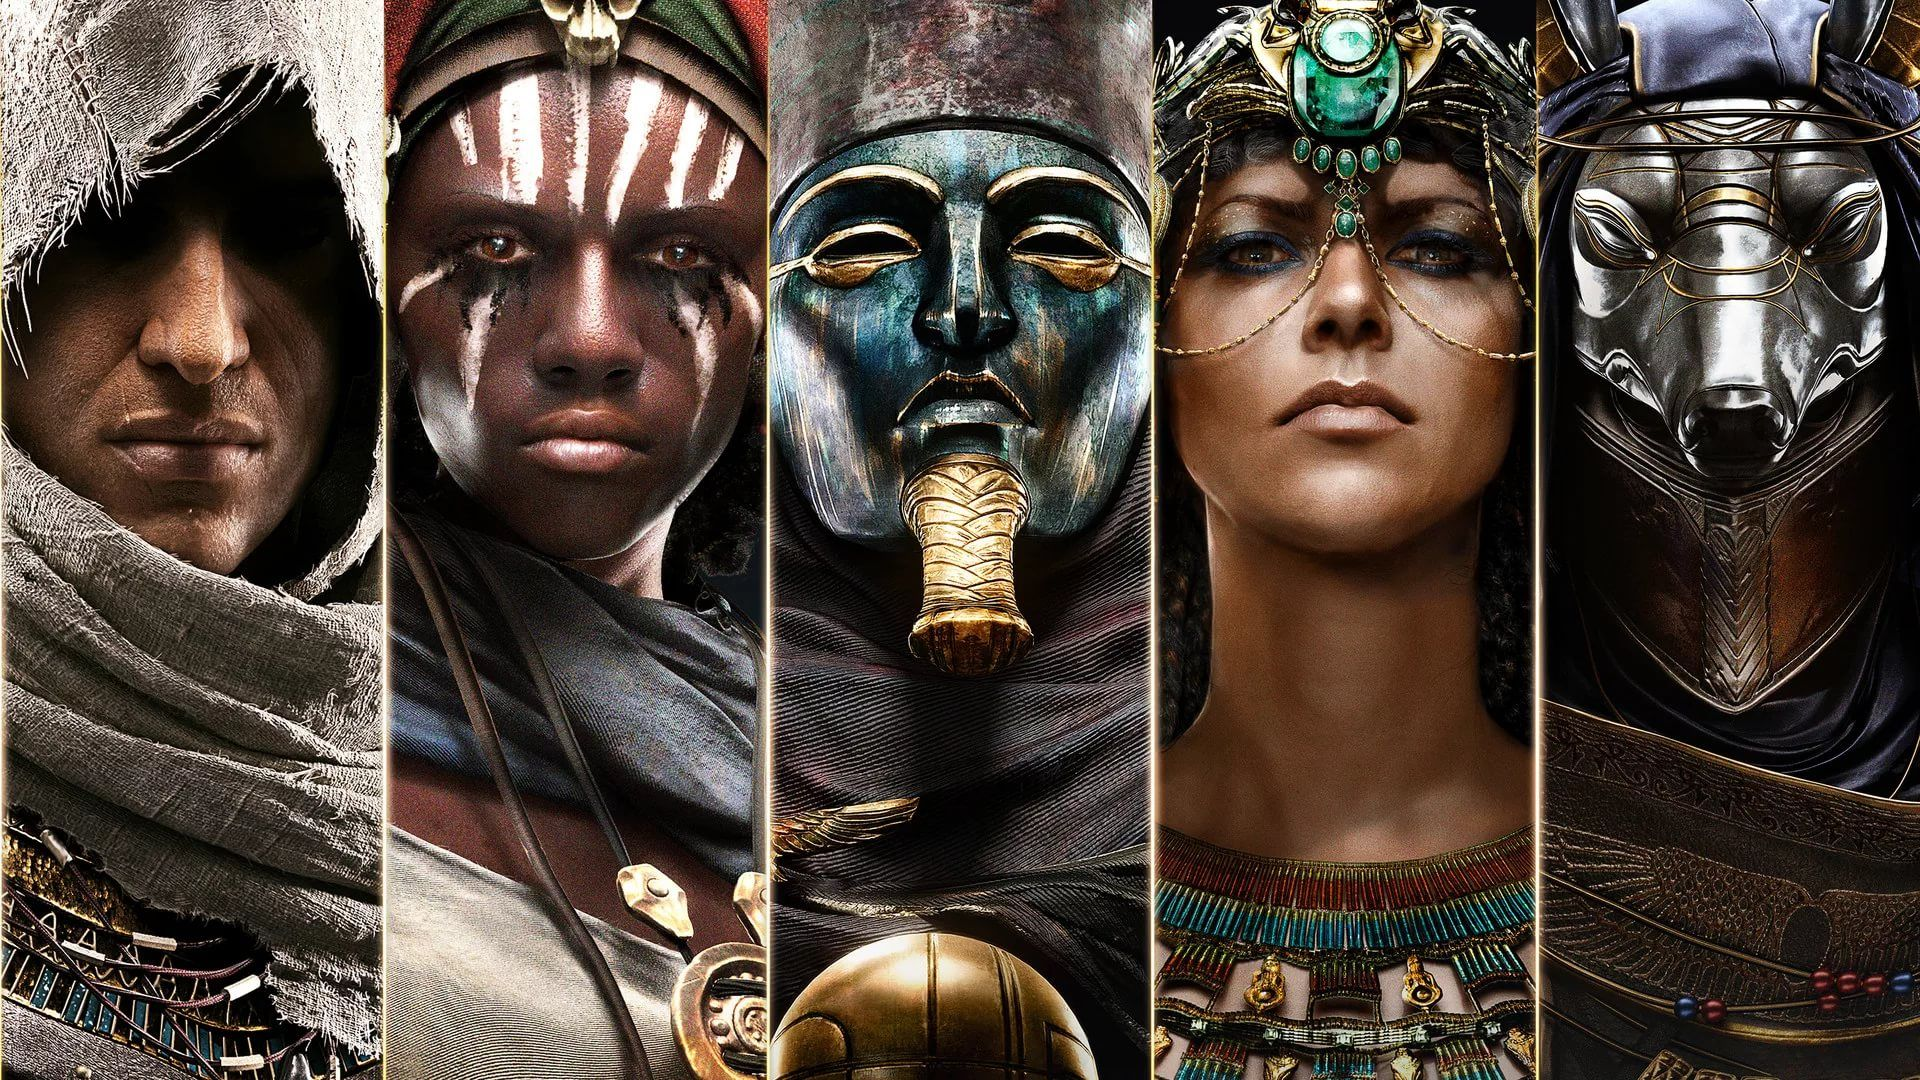 Cool Egyptian wallpaper photo full hd